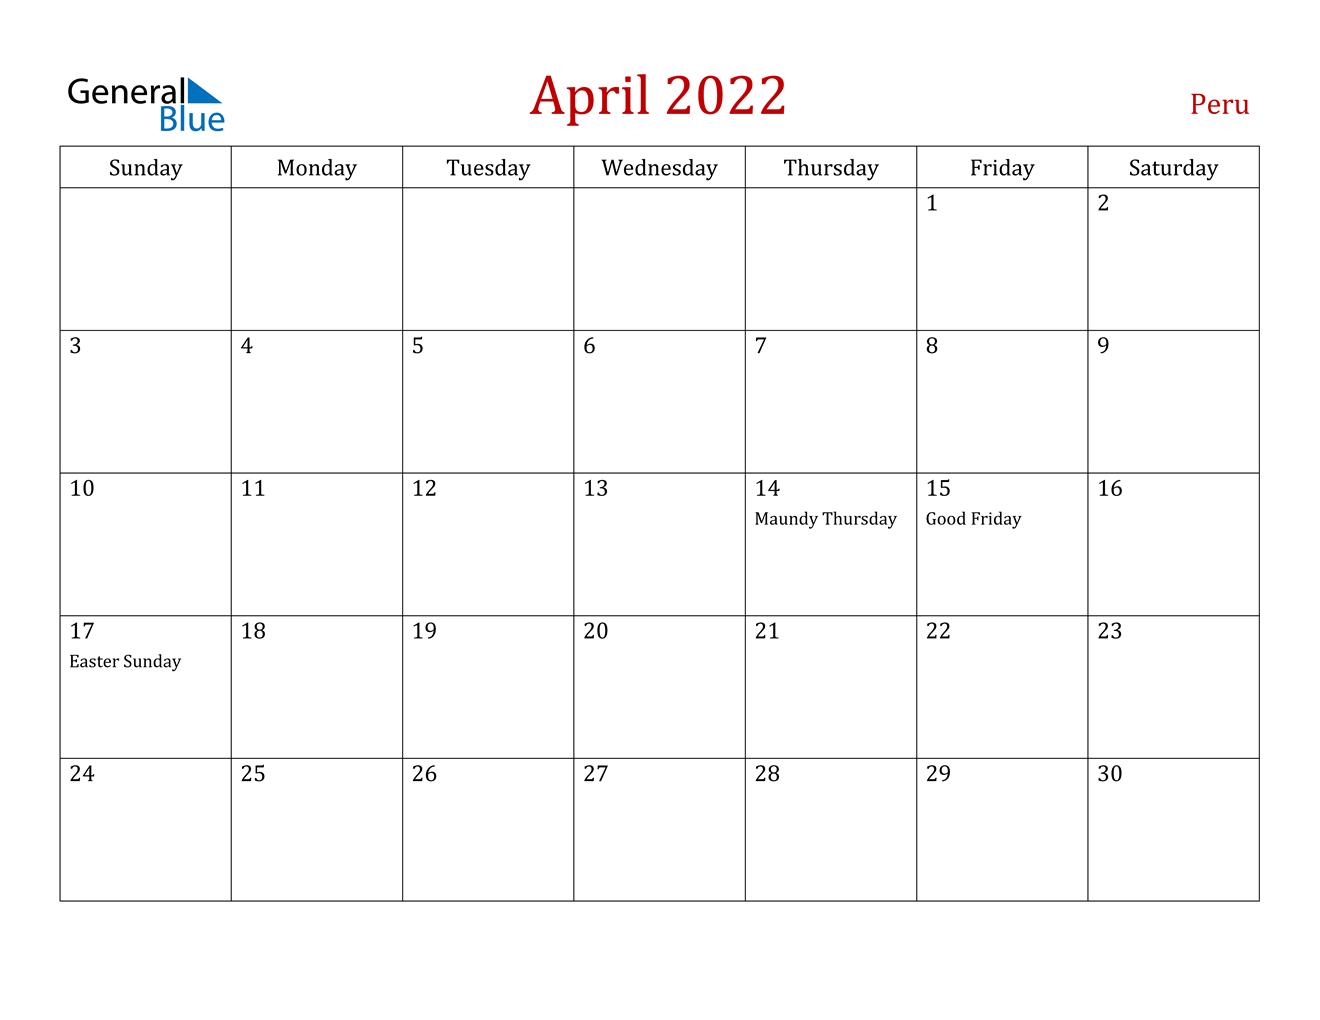 April 2022 Calendar - Peru in Blank Calendar Printable April 2022 Graphics